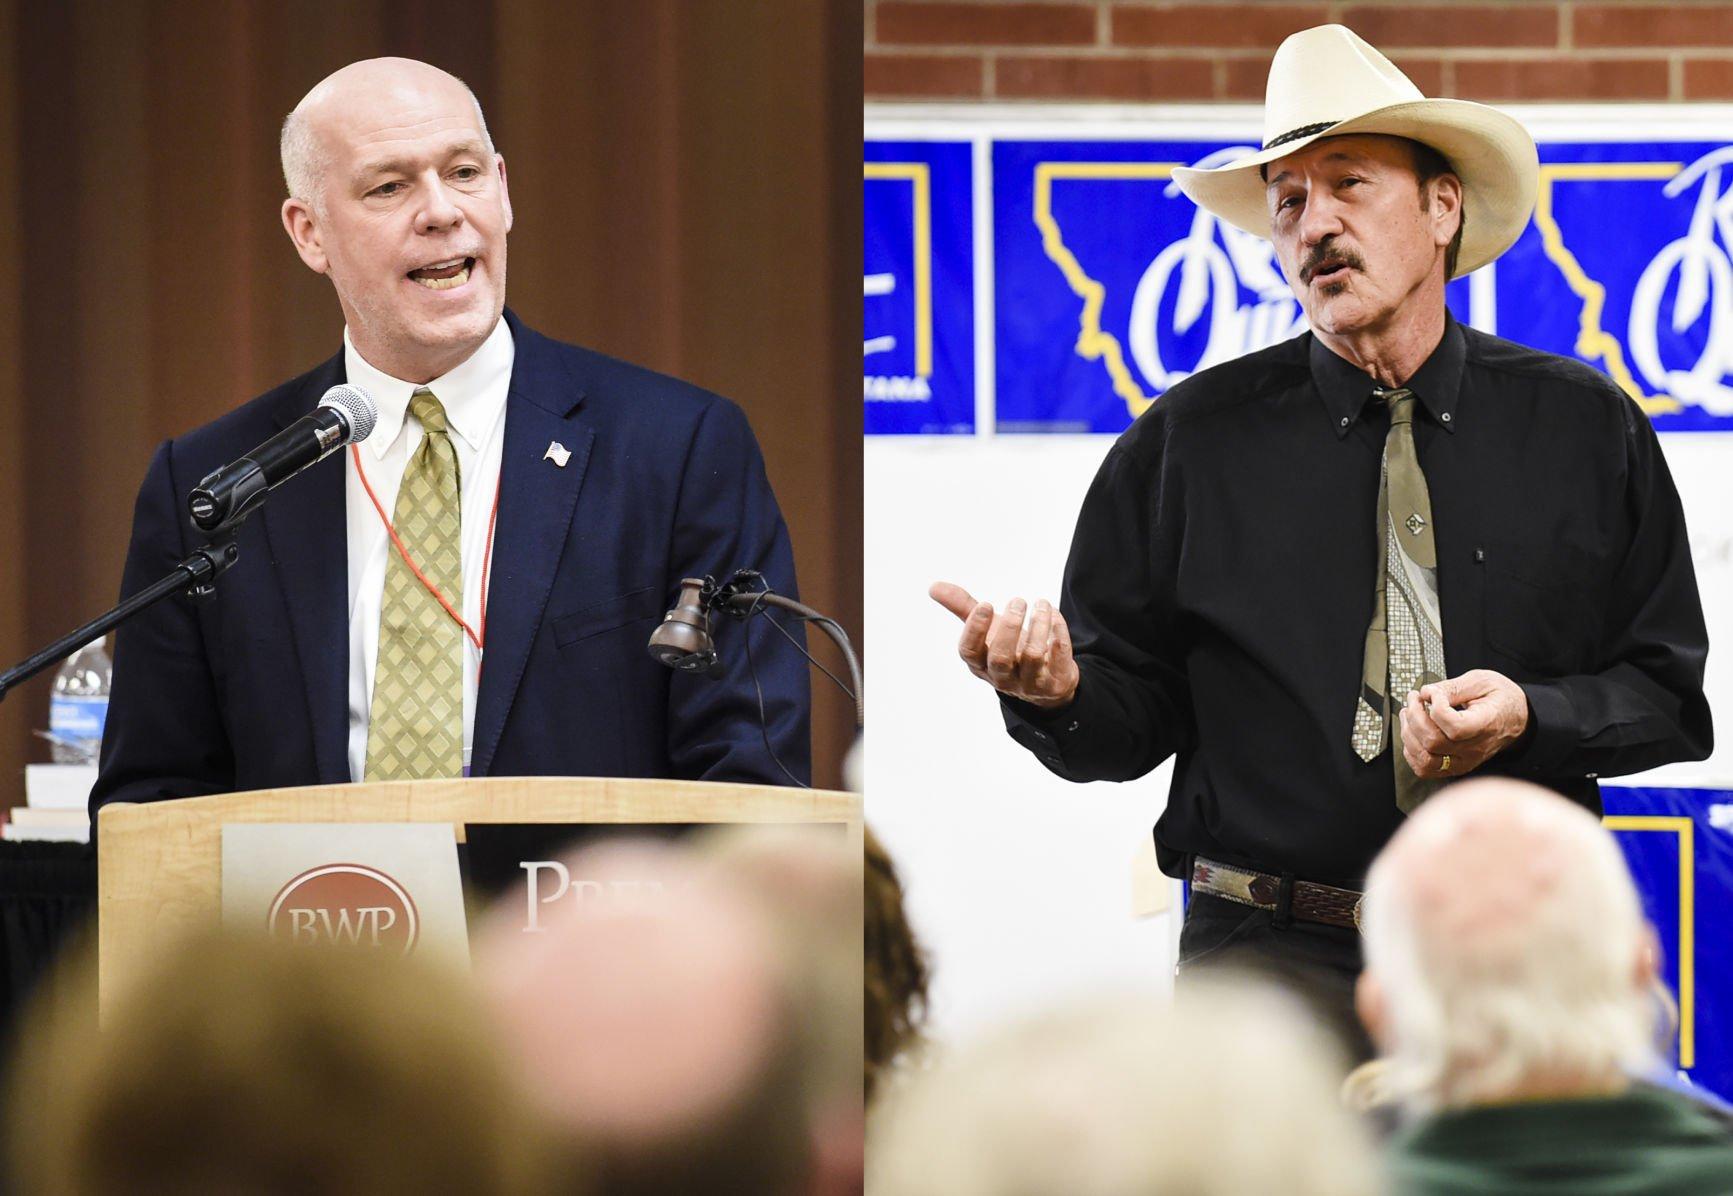 Montana congressional candidates Greg Gianforte R and